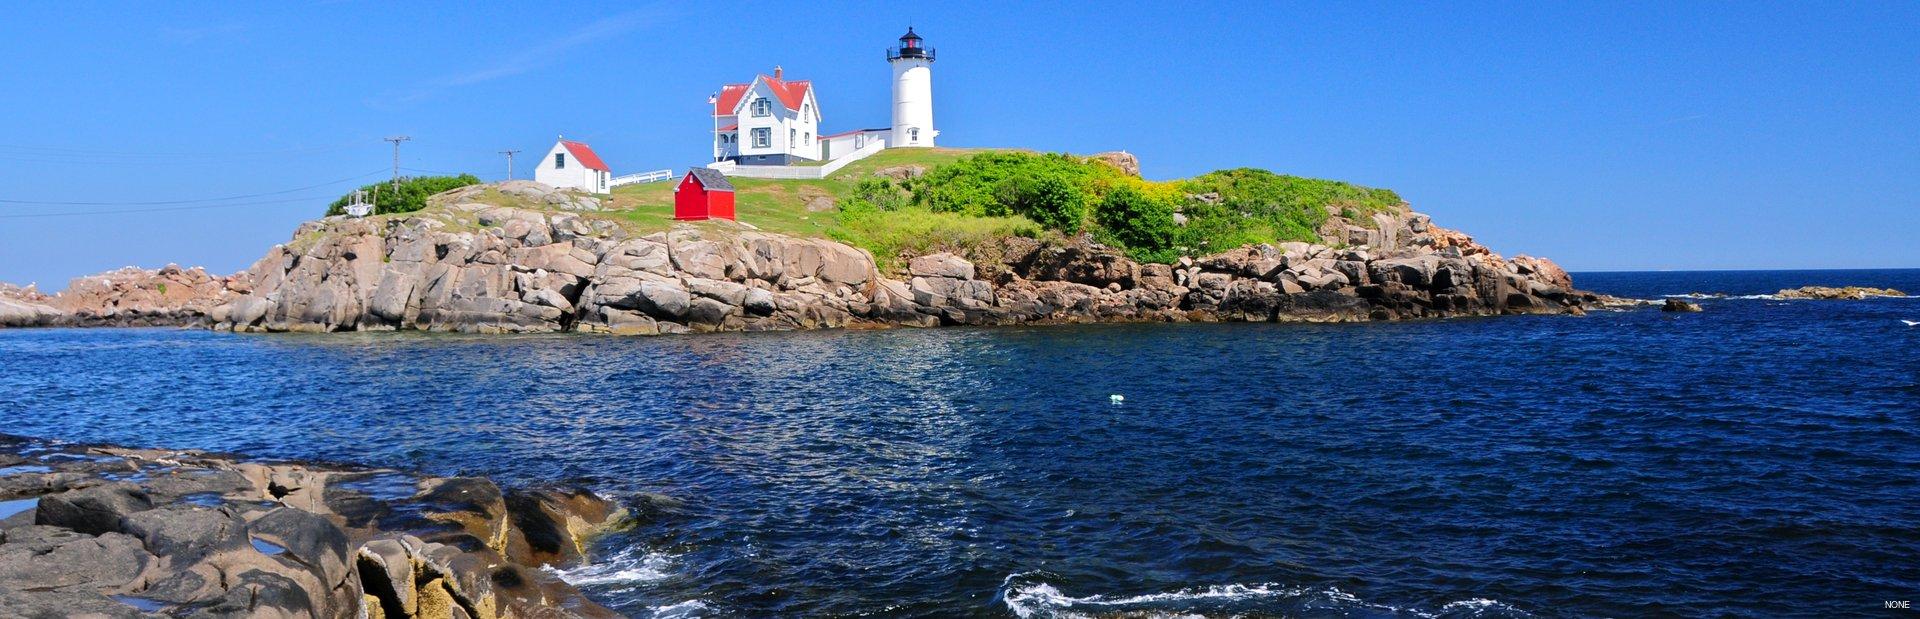 New England climate photo